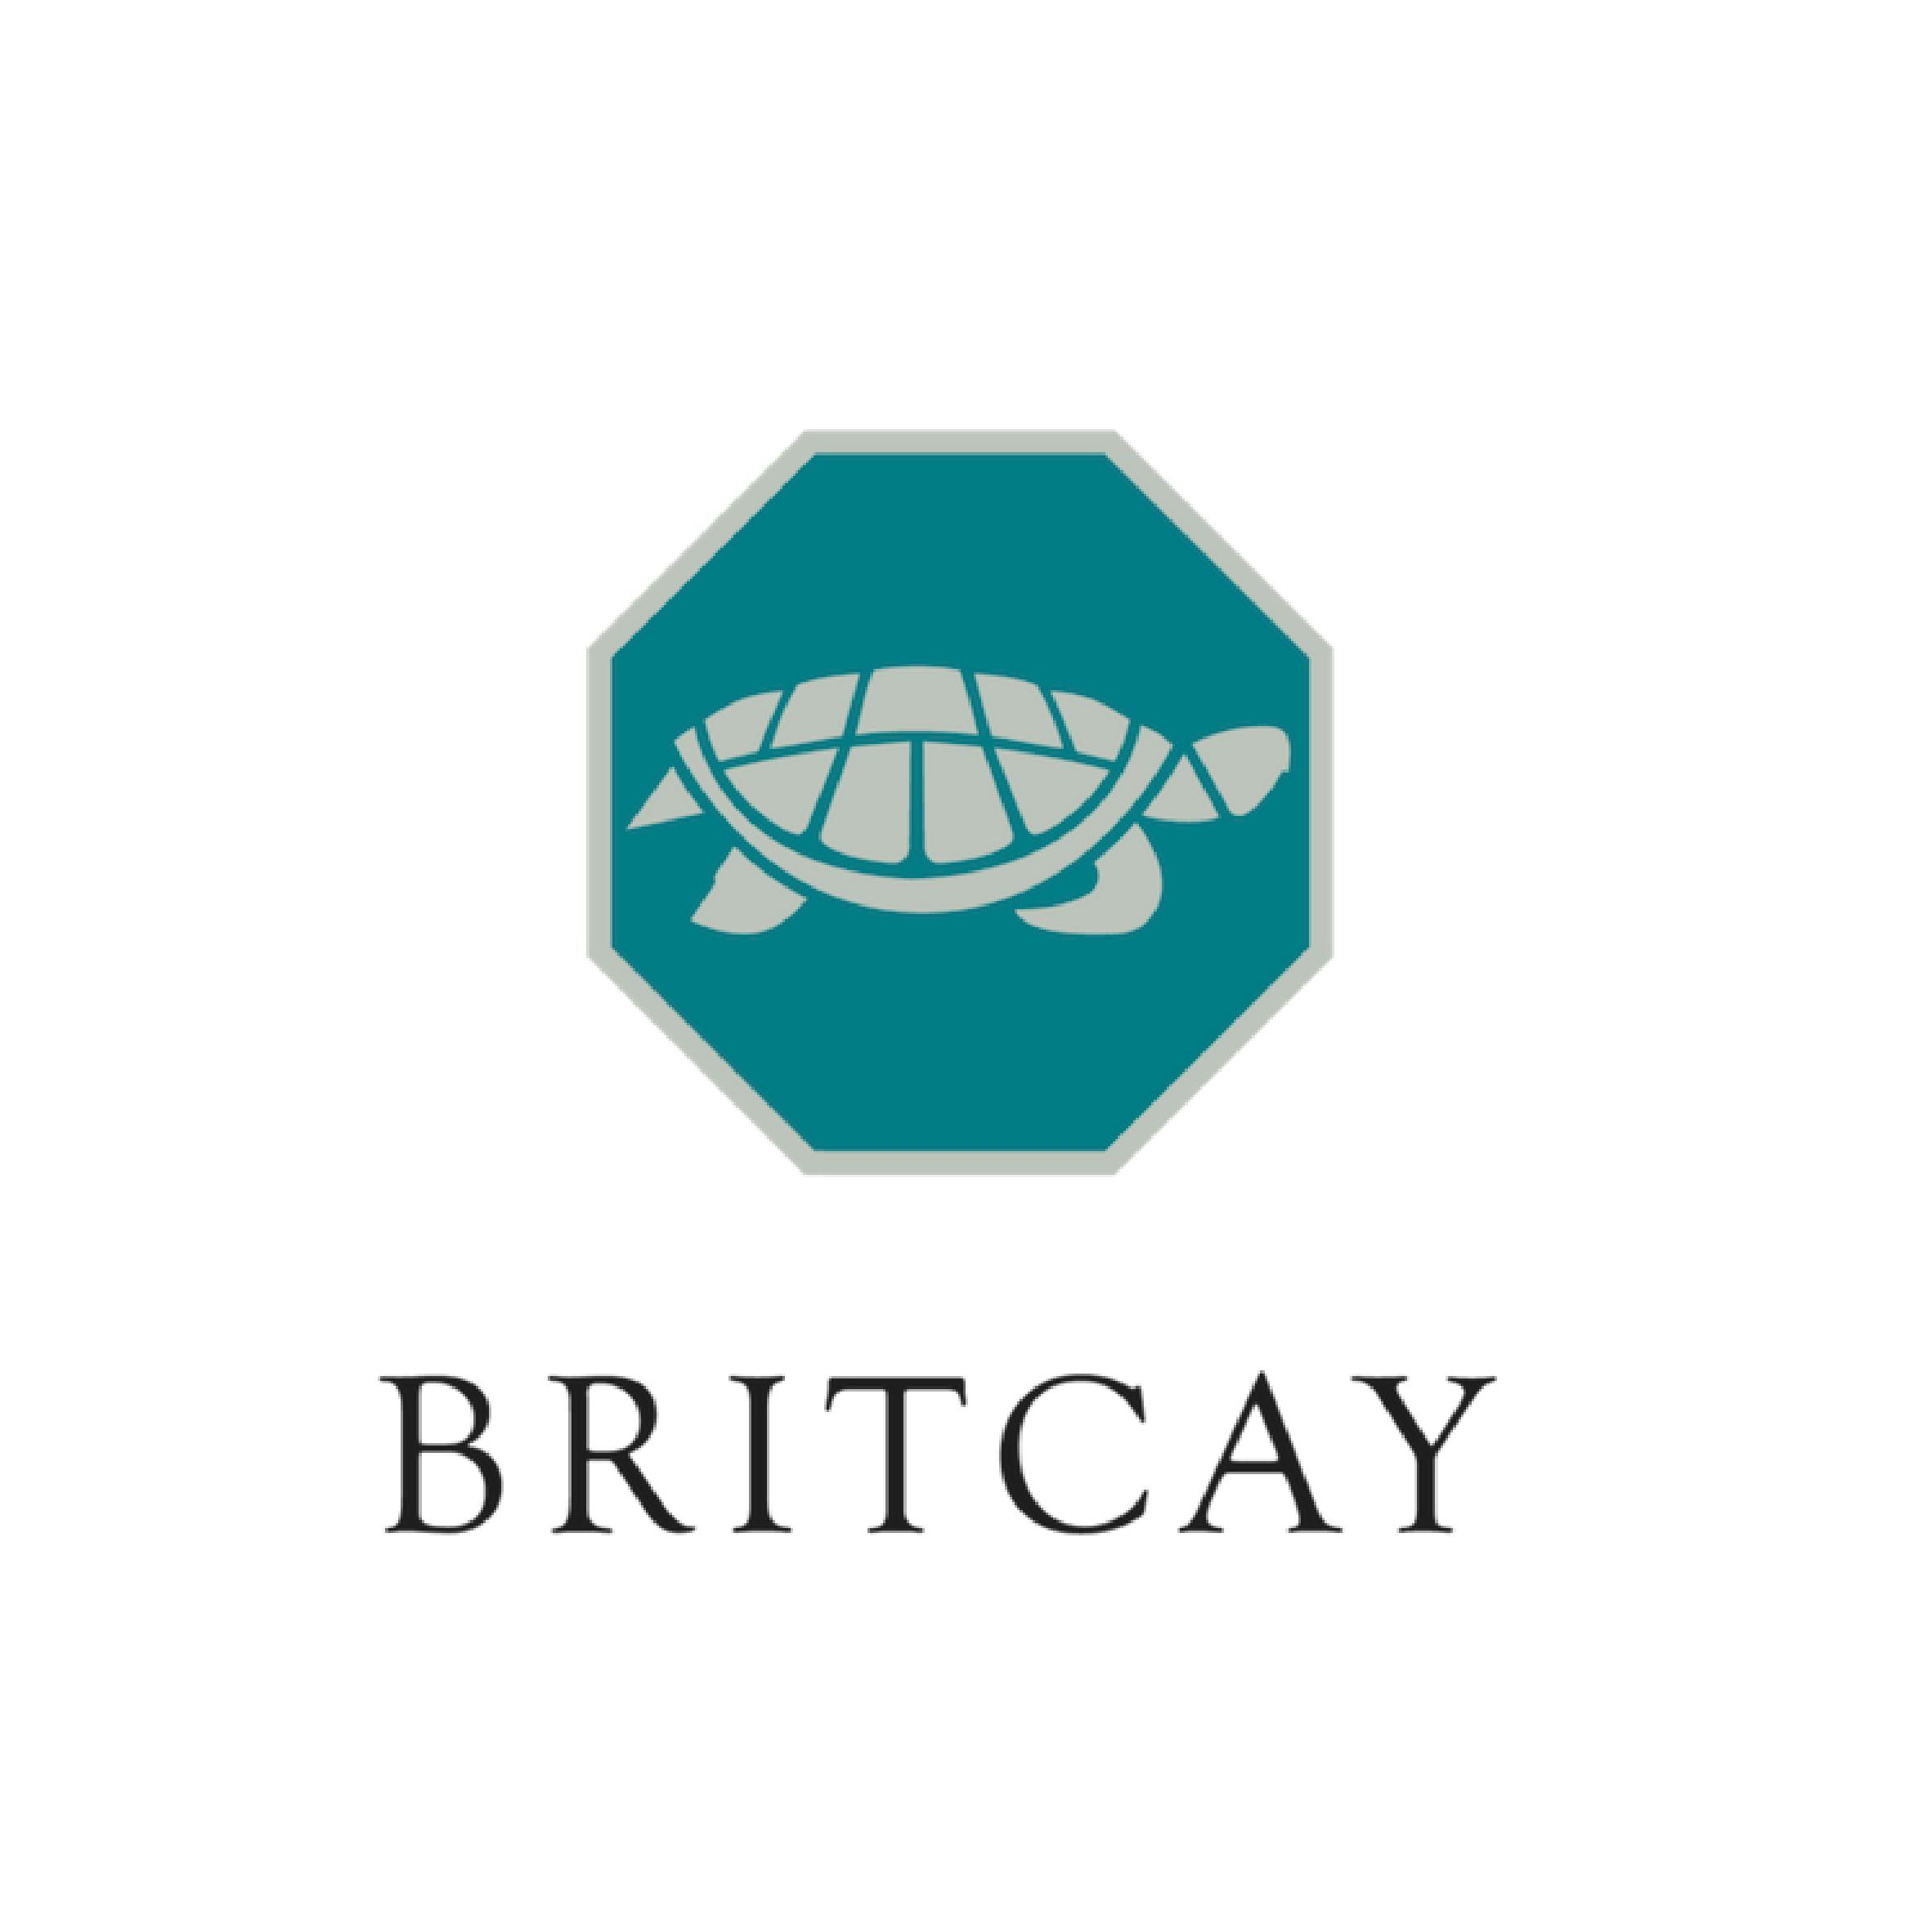 British Caymanian Insurance Company logo.